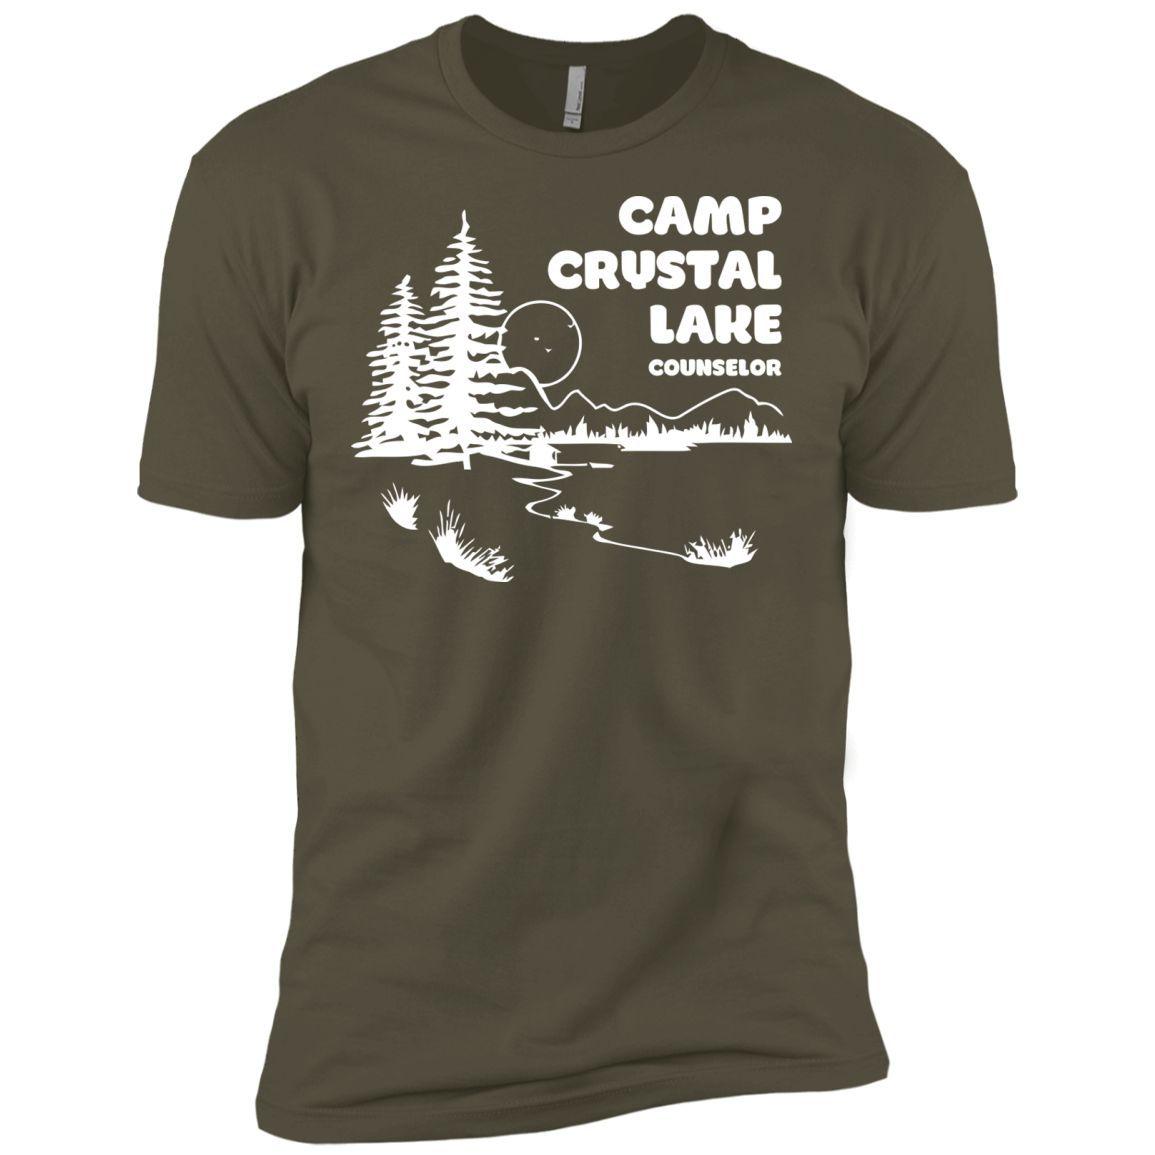 Camp Crystal Lake T-Shirt funny saying sarcastic movie humor (2)-01 Next Level Premium Short Sleeve Tee